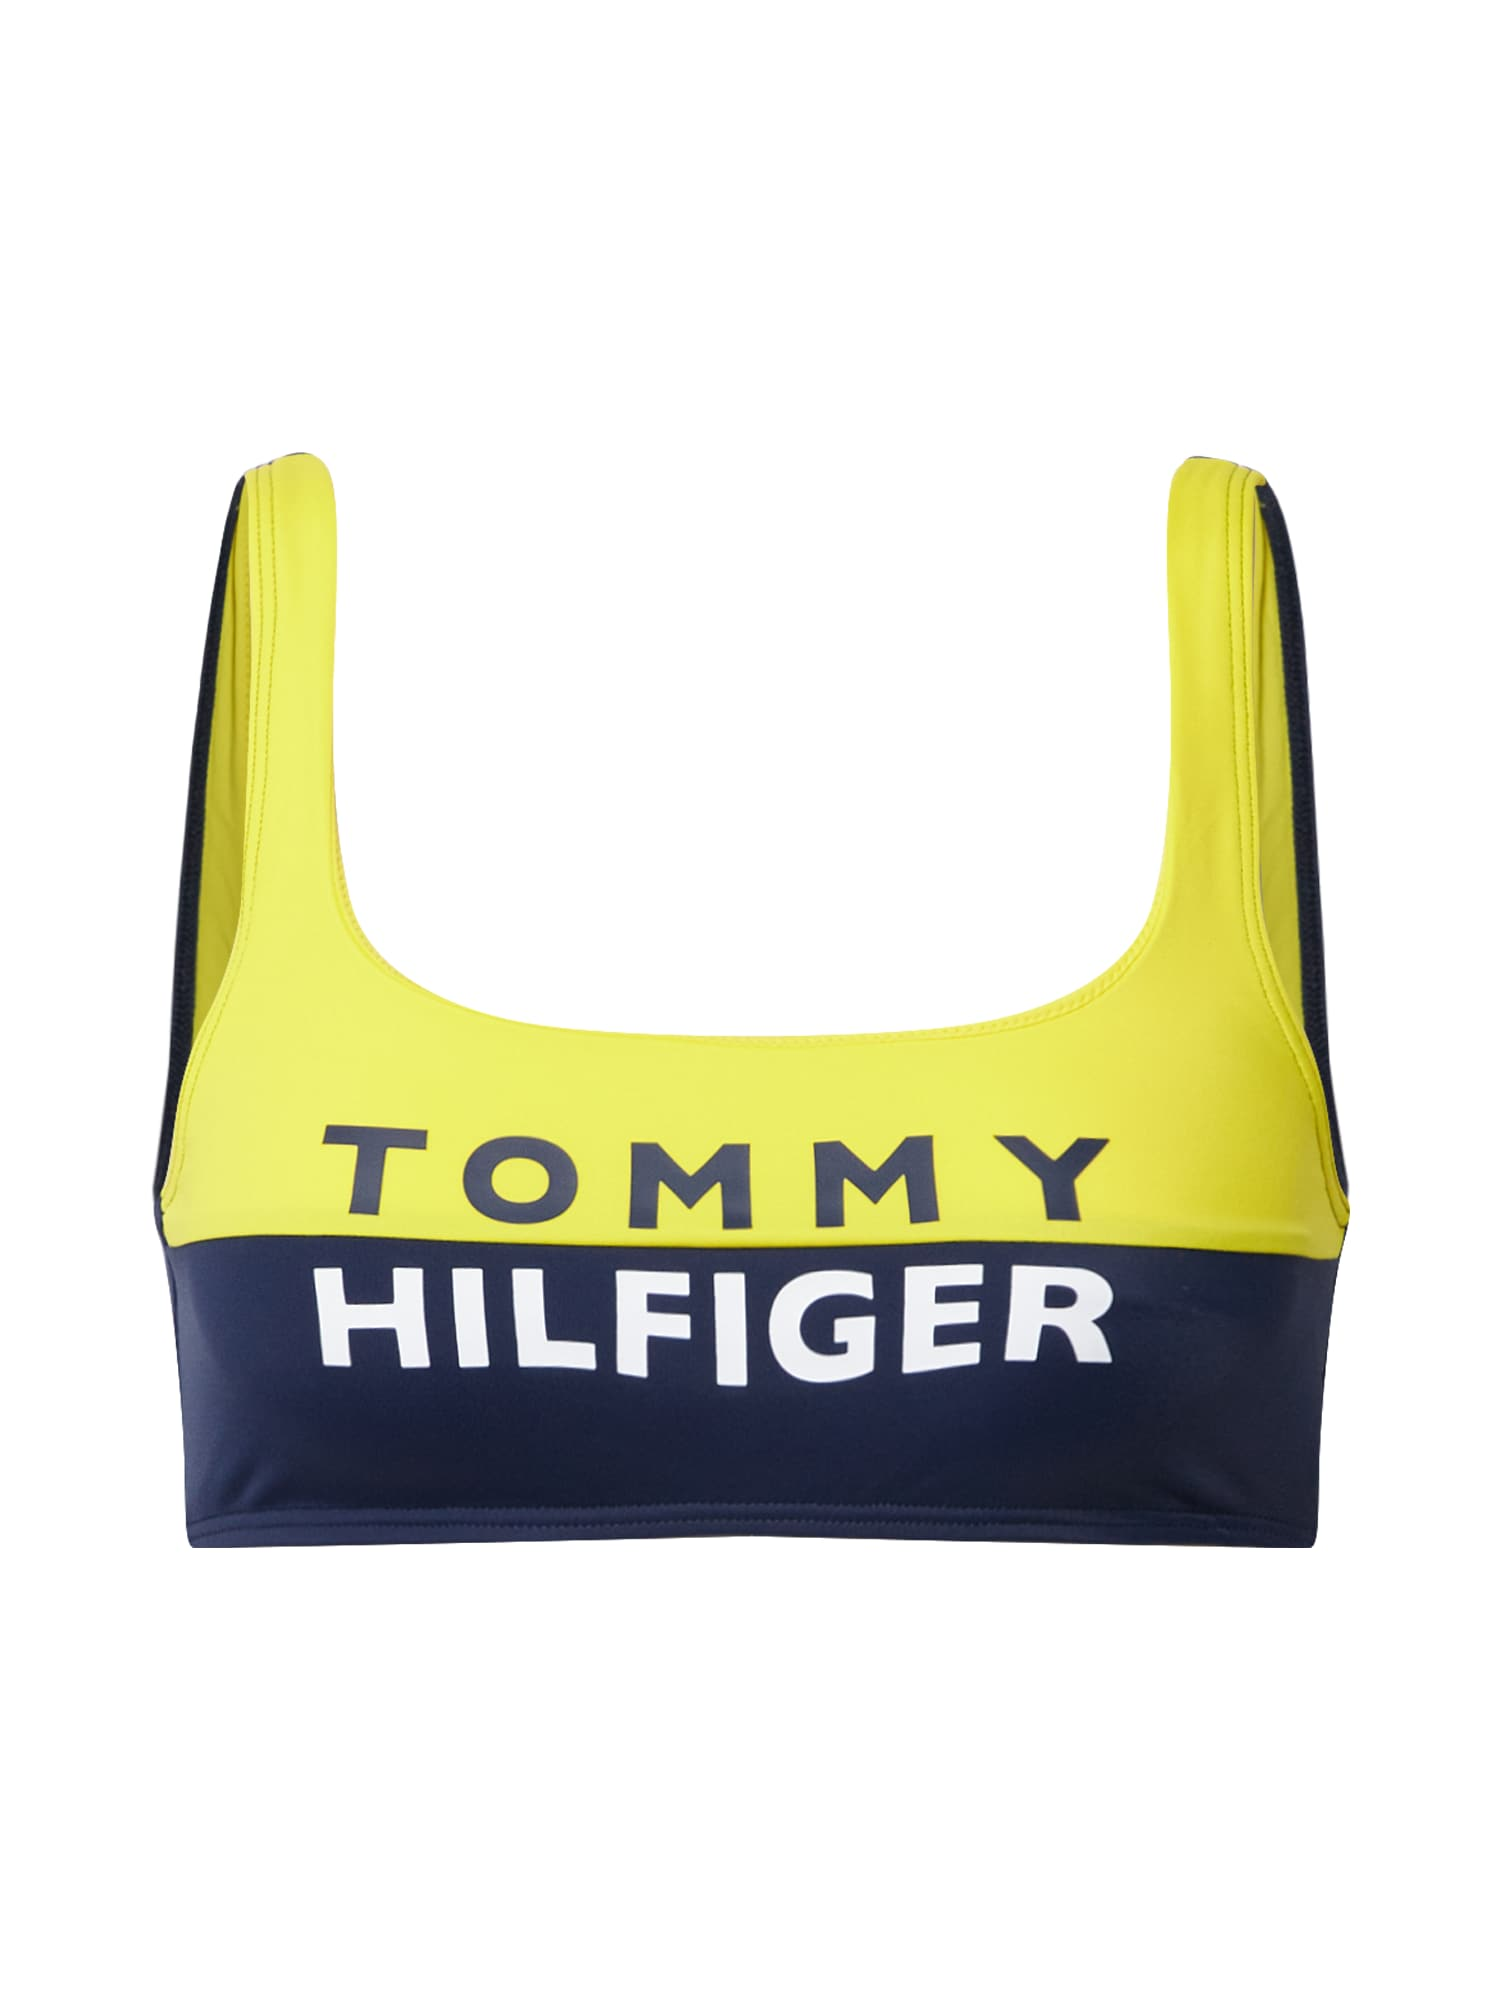 Tommy Hilfiger Underwear Liemenėlė geltona / juoda